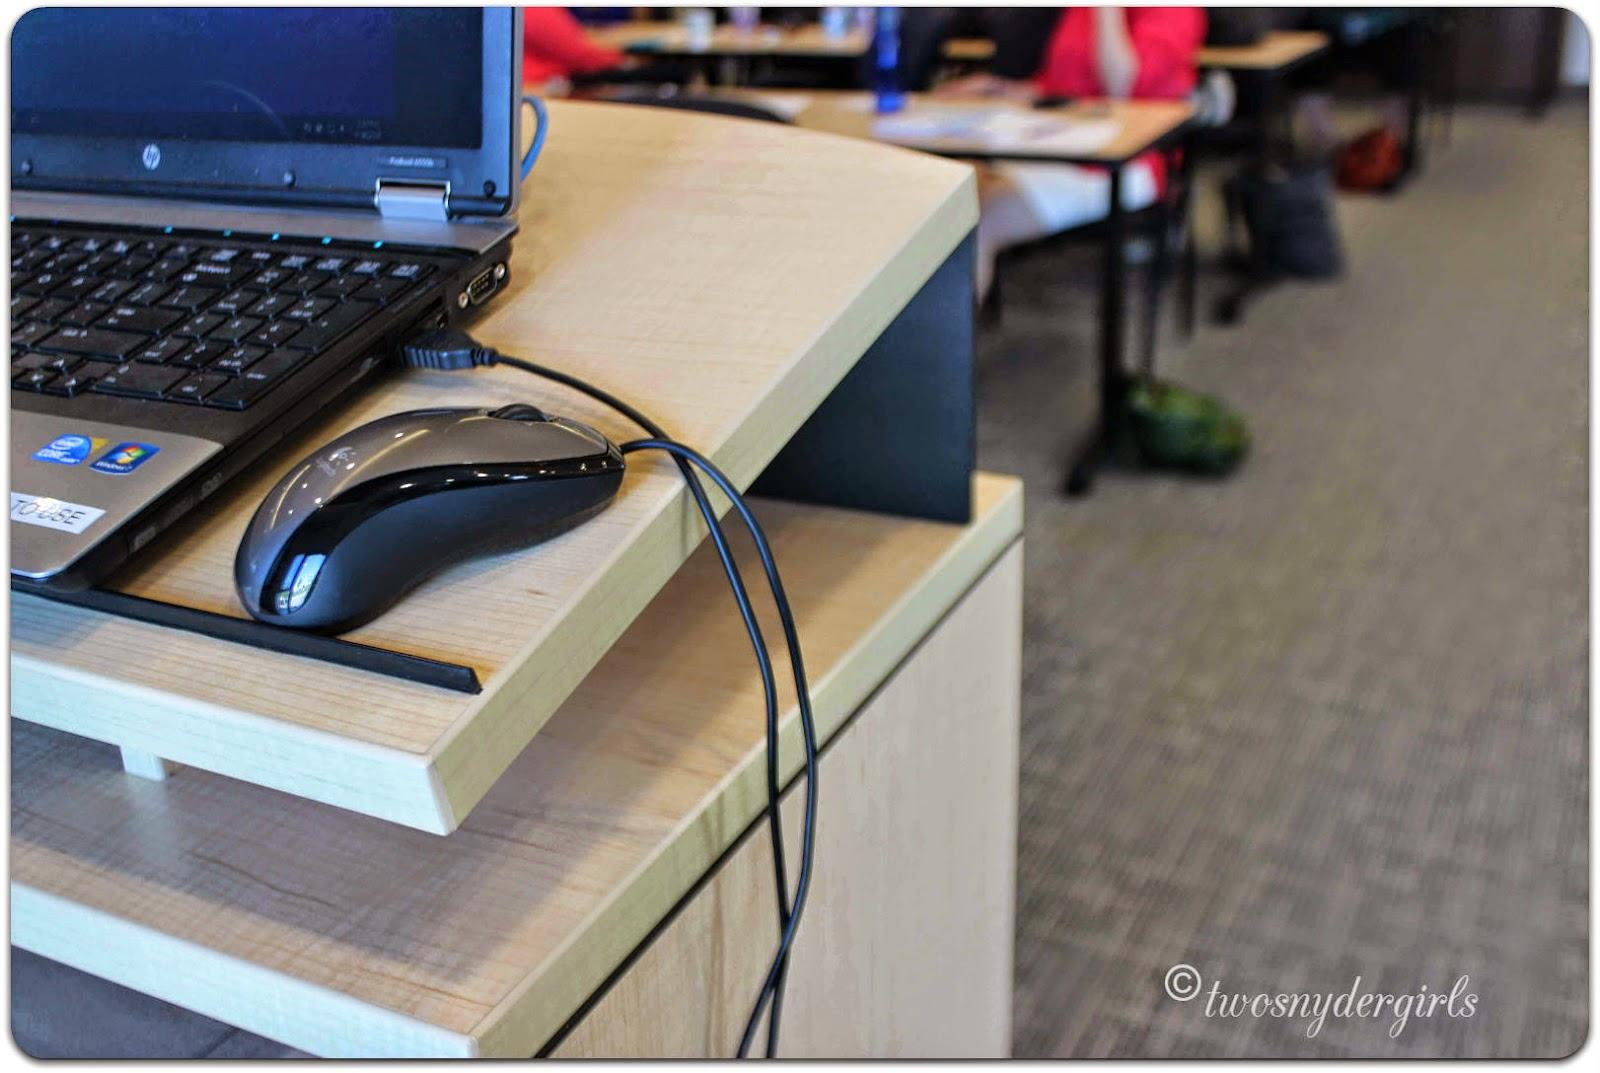 computer on a podium